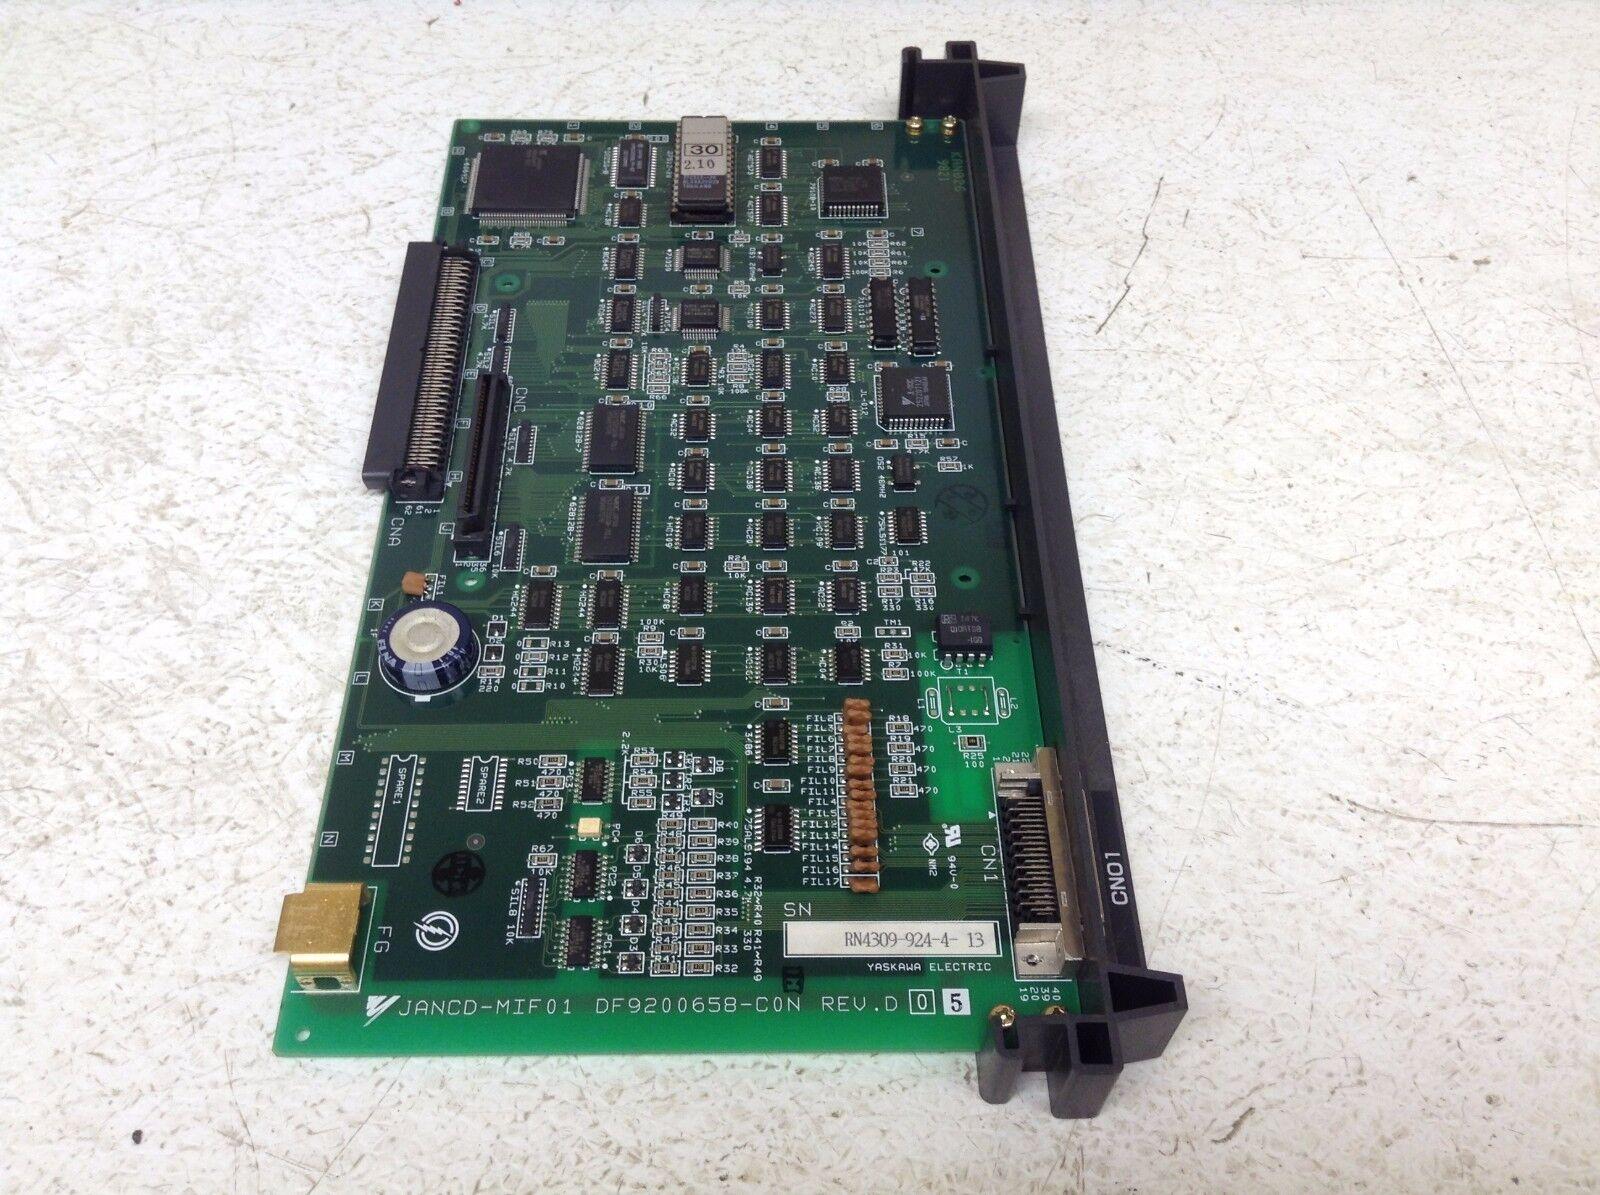 Yaskawa JANCD-MIF01 PCB Control Board Rev D JANCDMIF01 (TB)